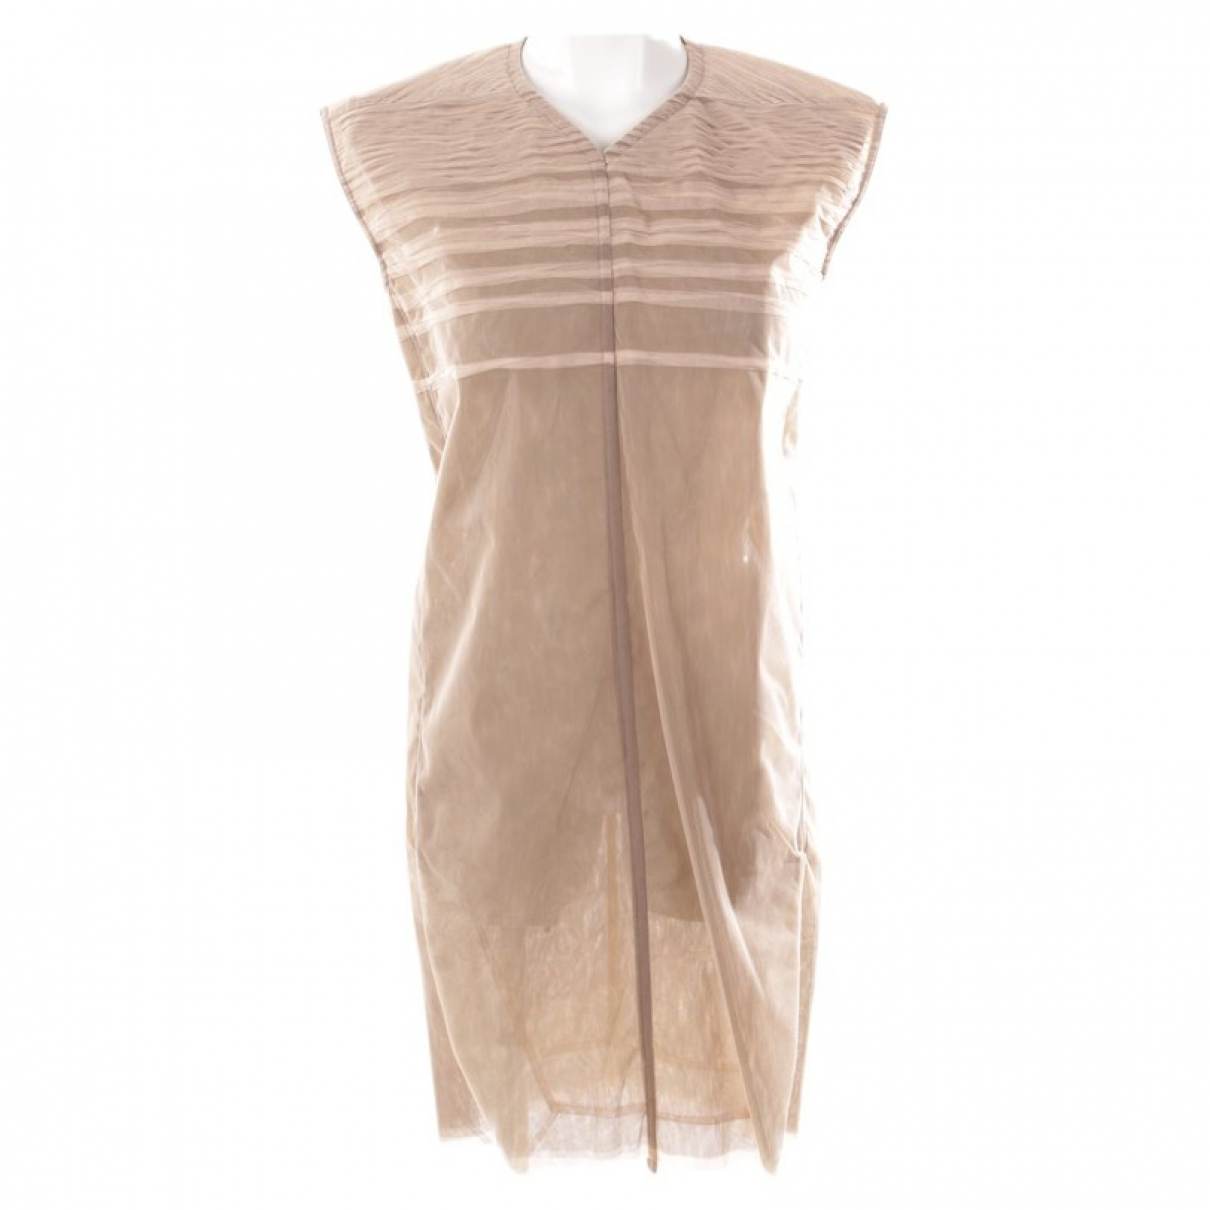 Rick Owens \N Beige dress for Women M International